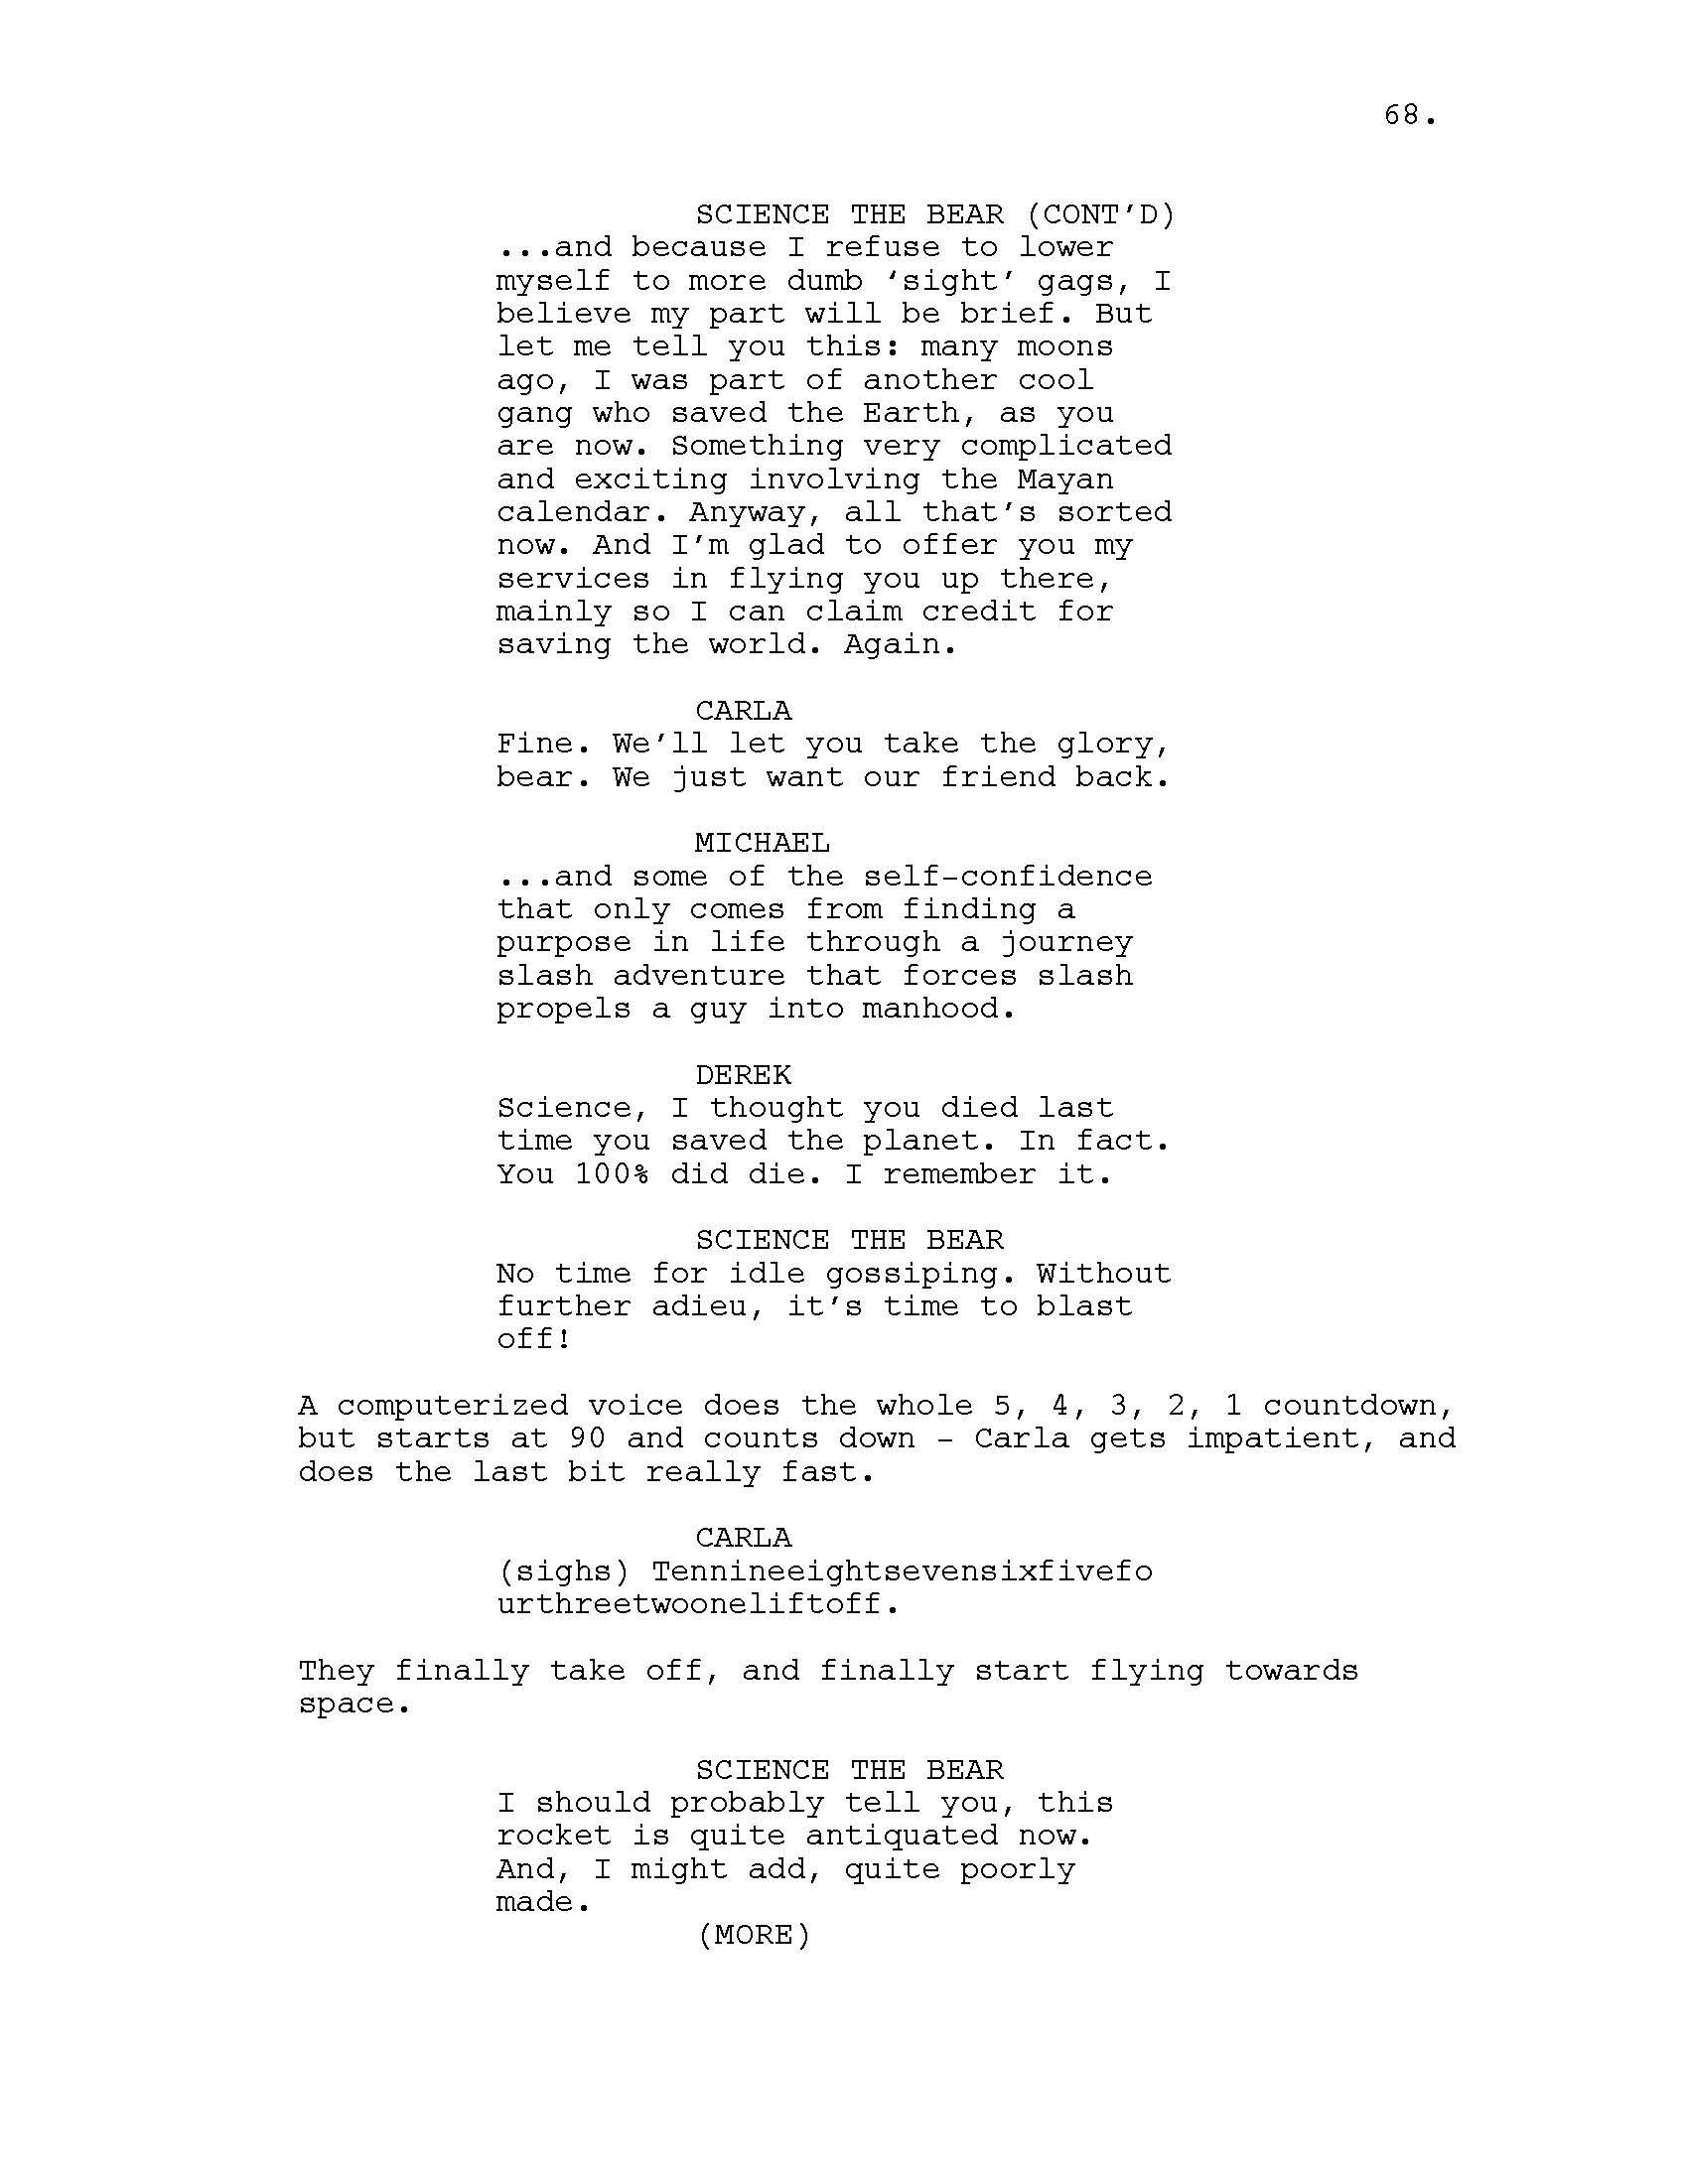 INVISIBLE WORLD SCRIPT_Page_069.jpg